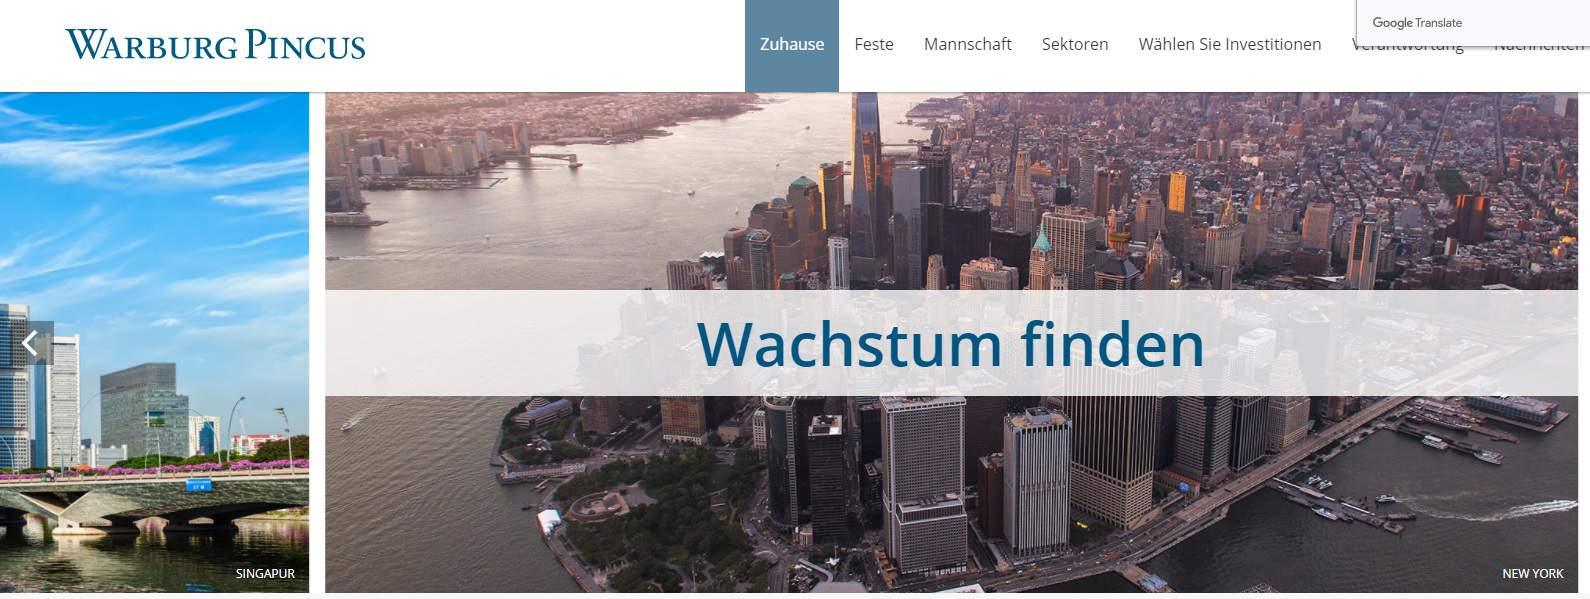 Warburg Pincus Private Equity Germany Ranking: Top 15 Deutschland Liste